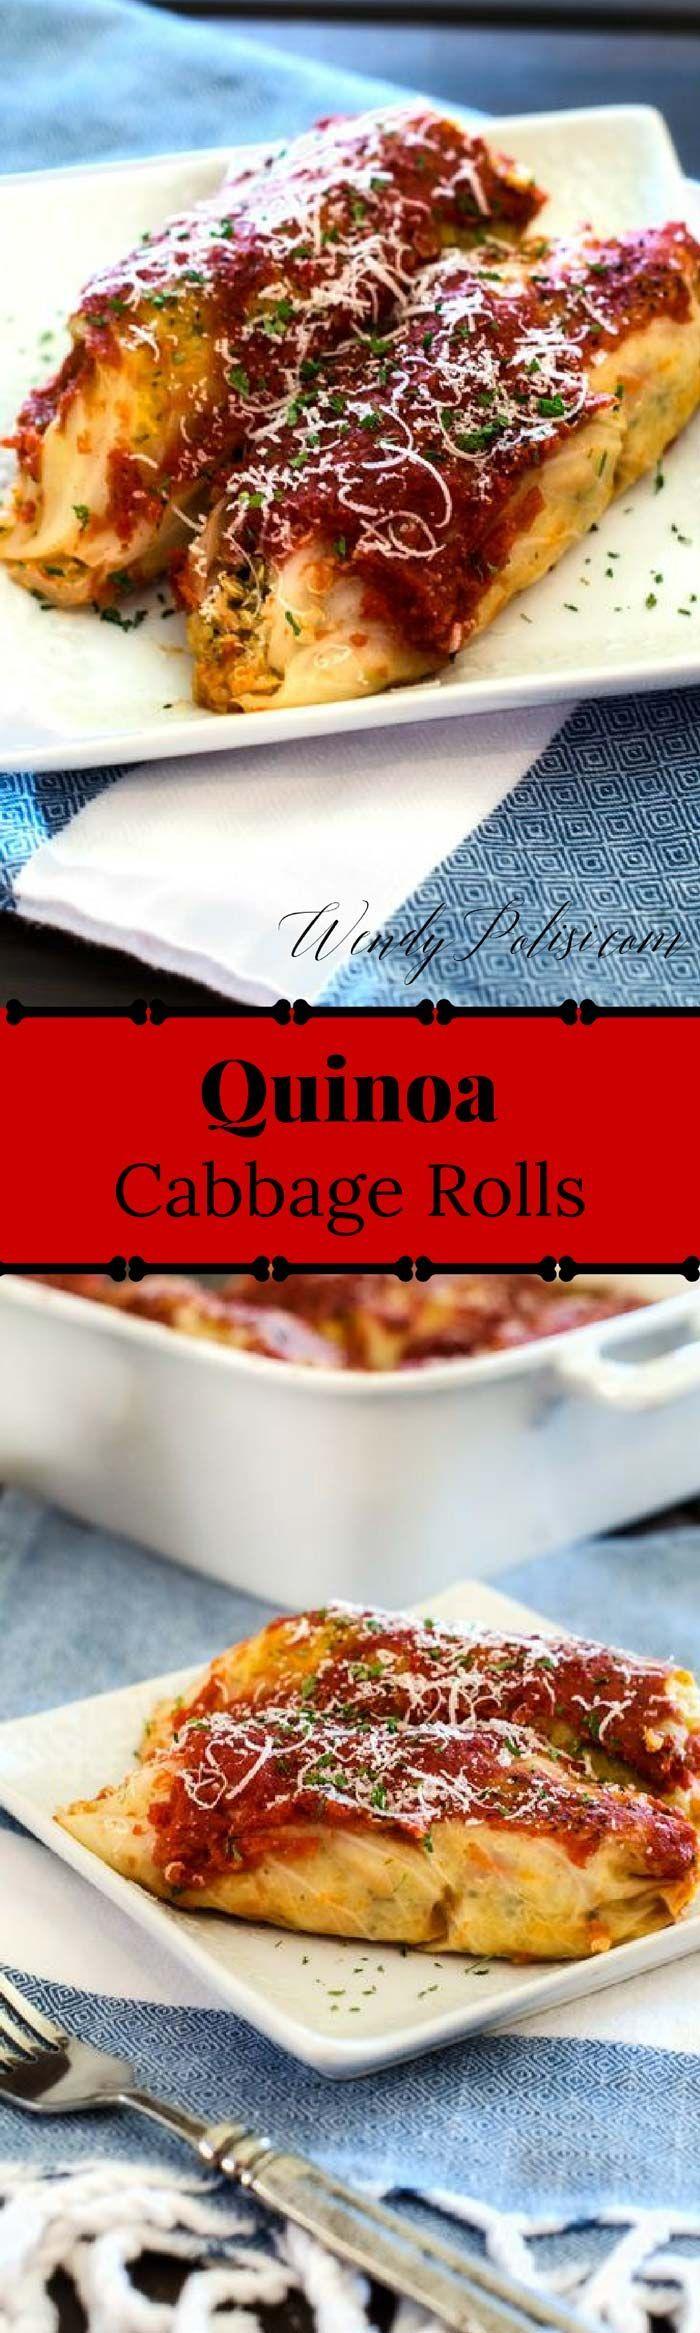 Quinoa Cabbage Rolls via @wendypolisi